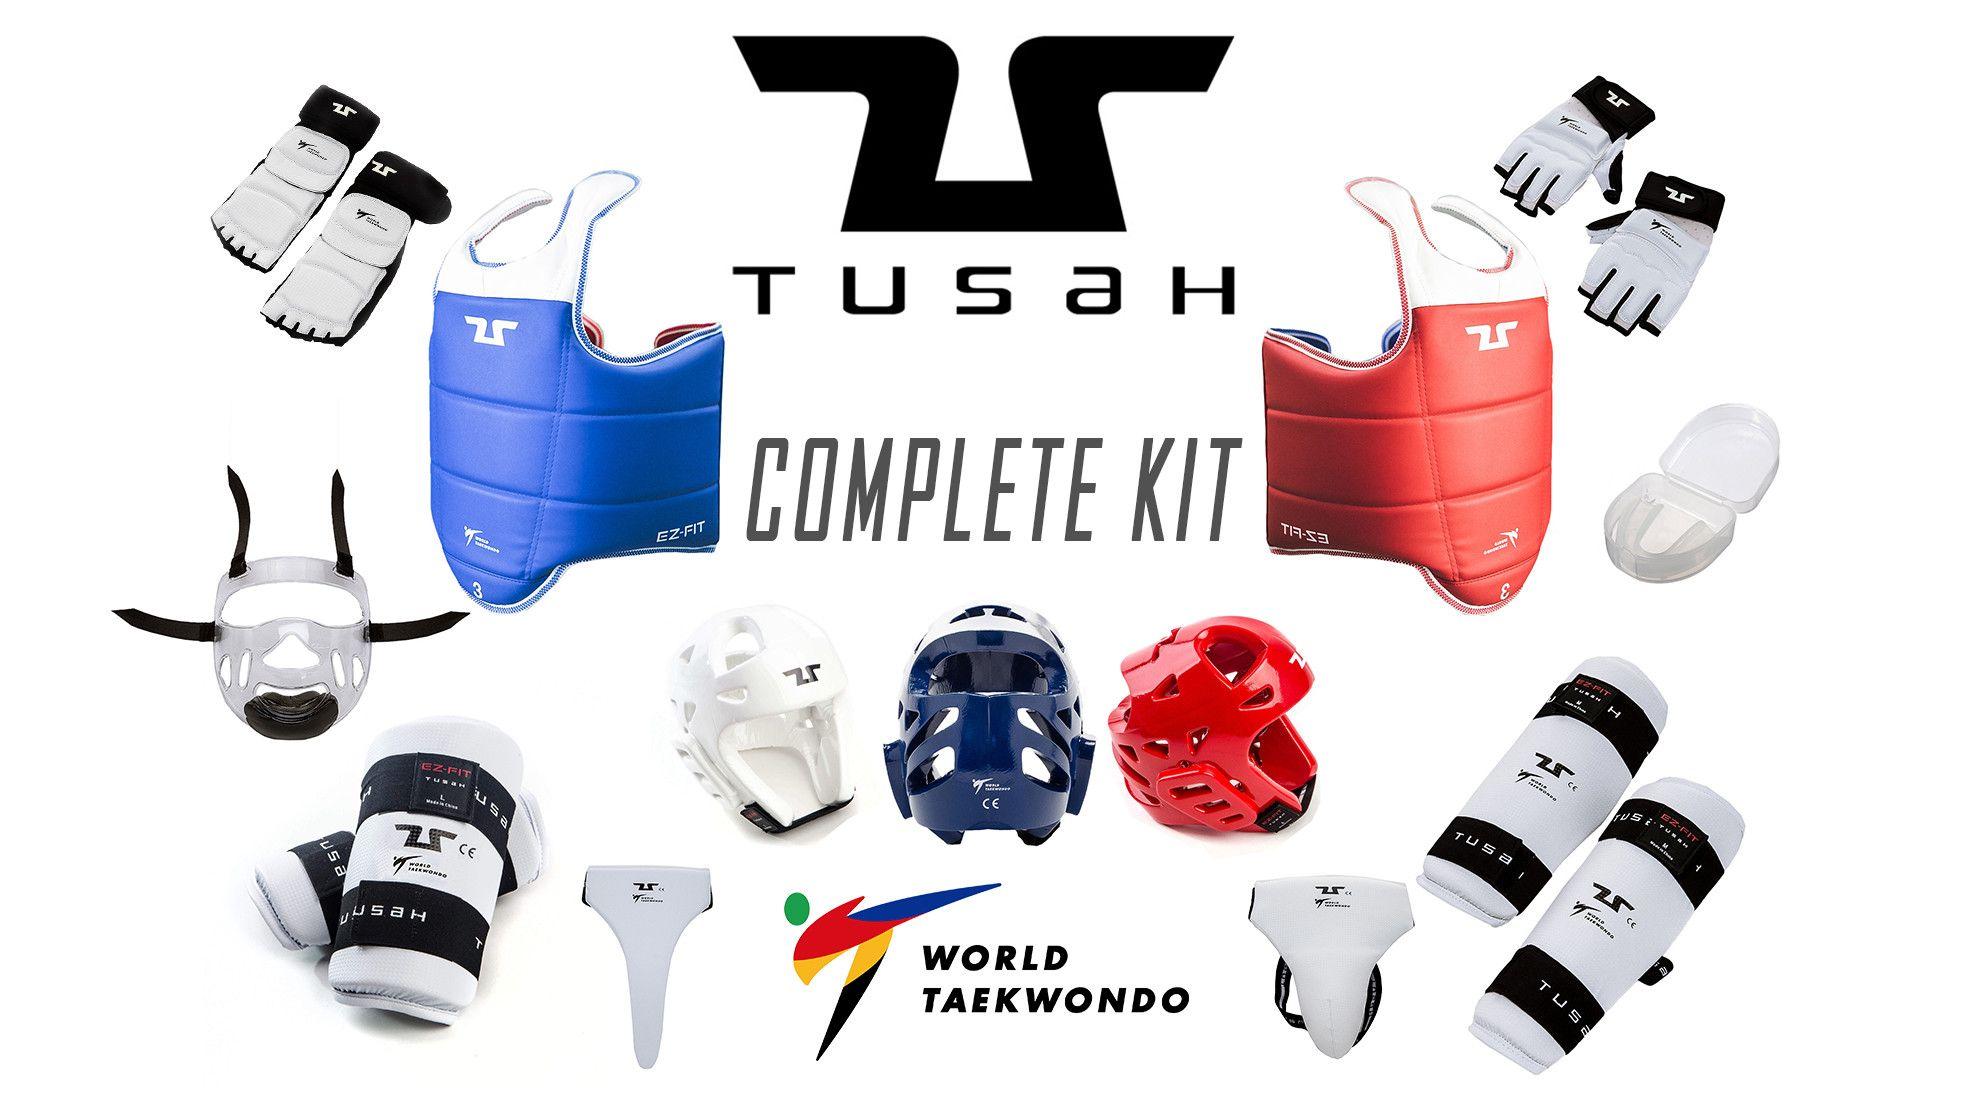 KIT Offerta Protezioni per Taekwondo Tusah Completo Omologato WT WTF